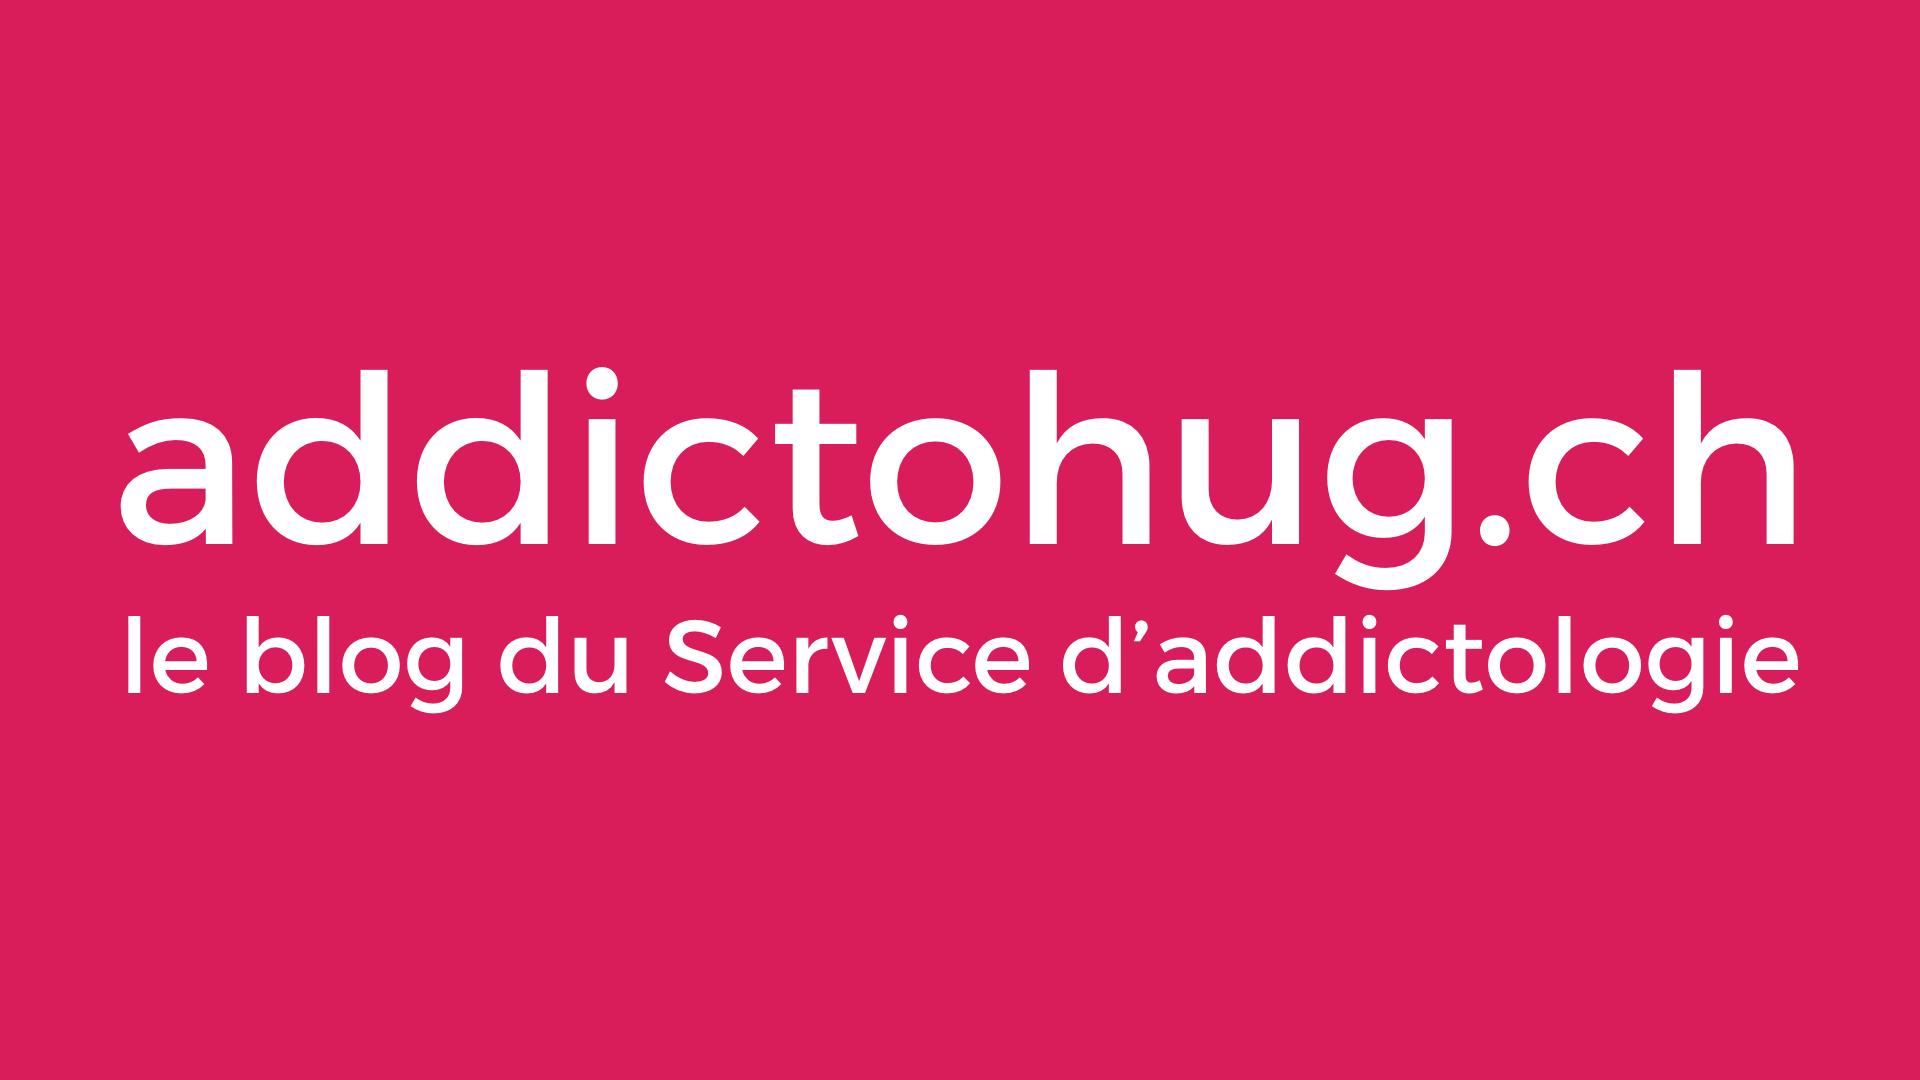 addictohug.ch ?